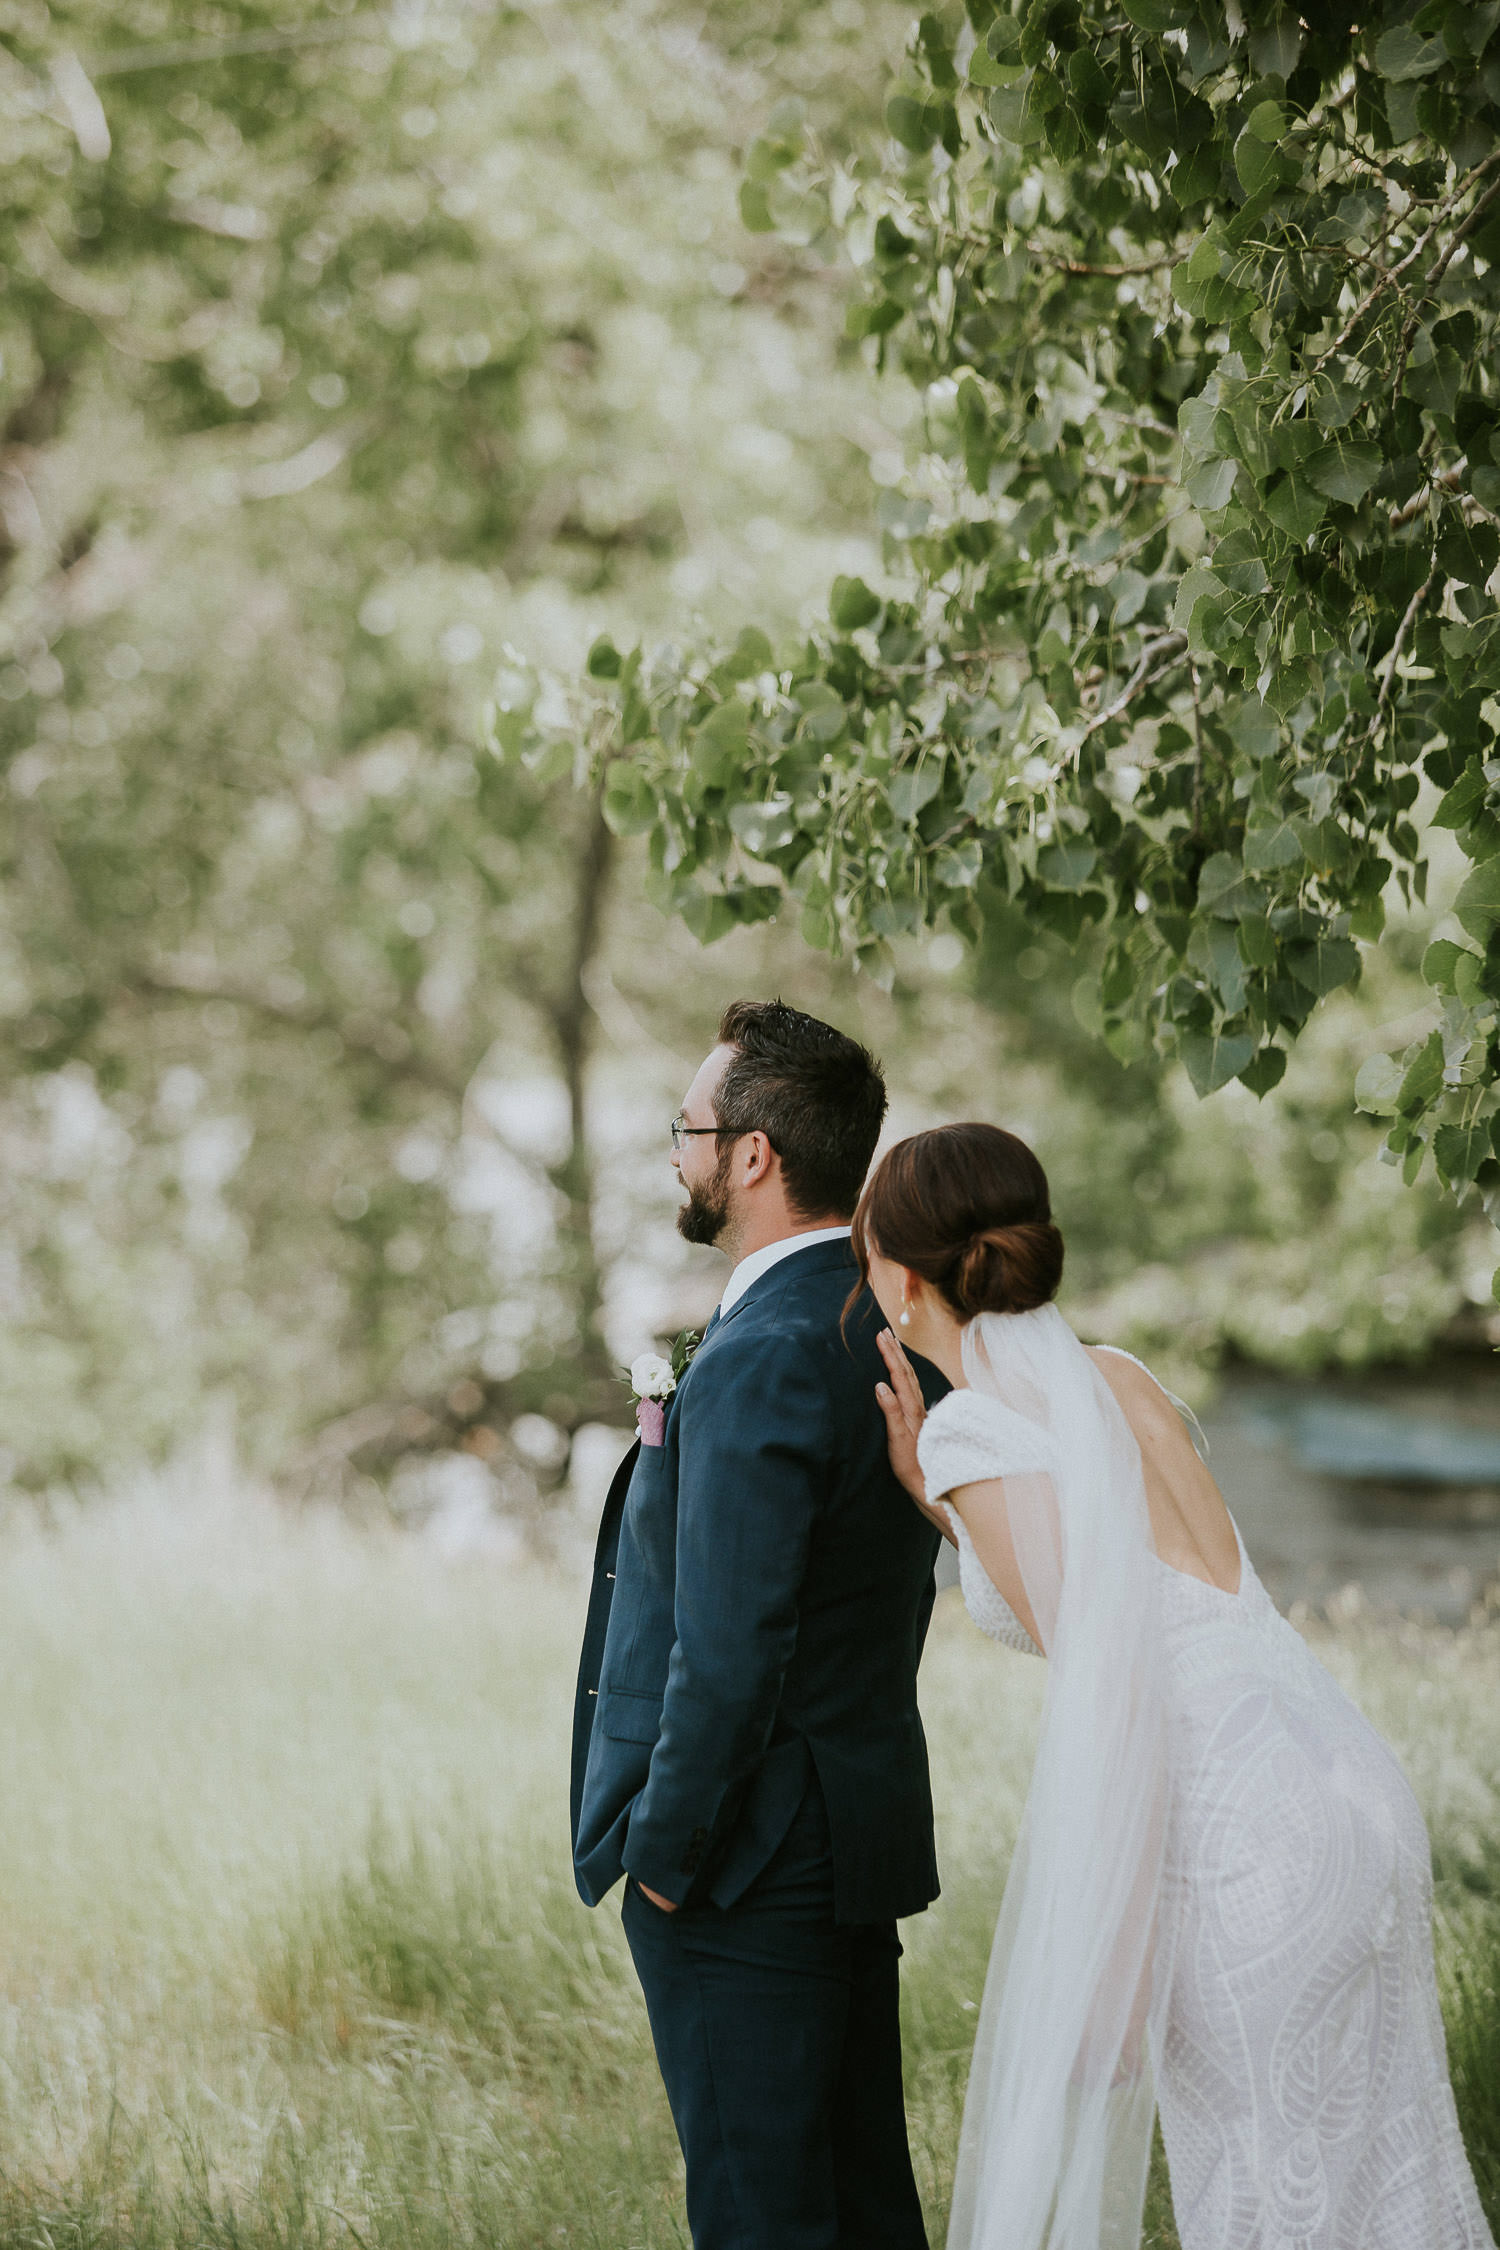 summer-backyard-wedding-in-alberta-sarah-pukin-0042